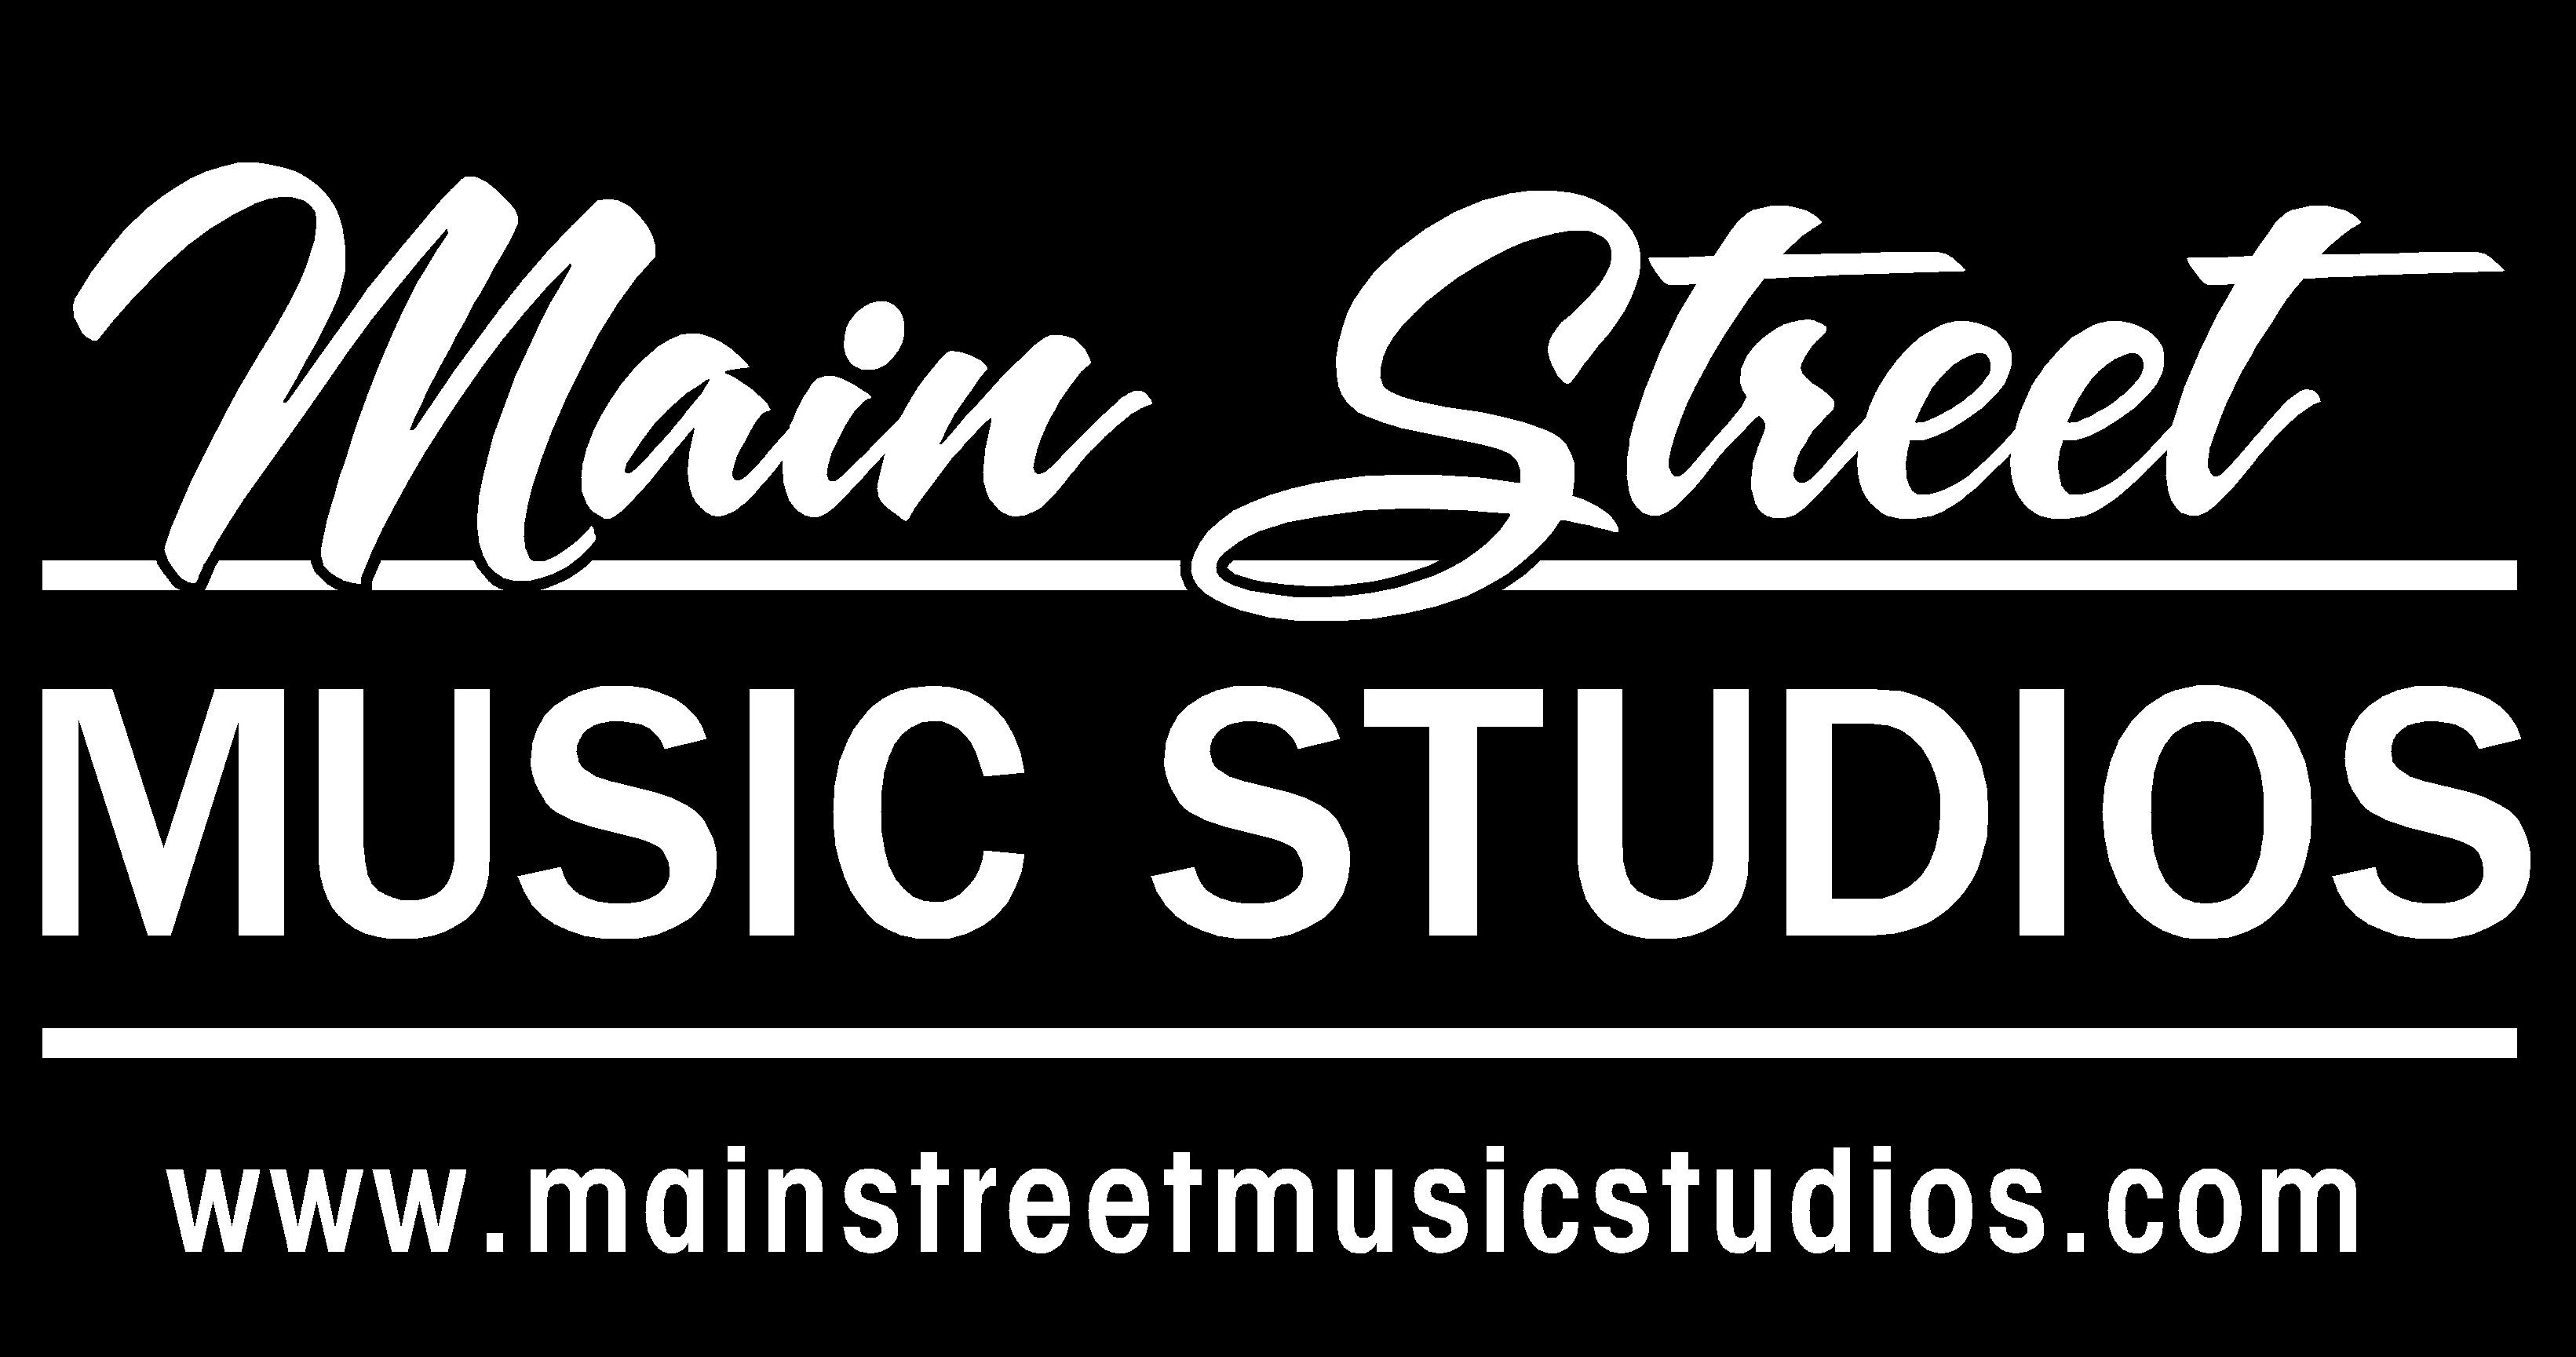 Main Street Music Studios